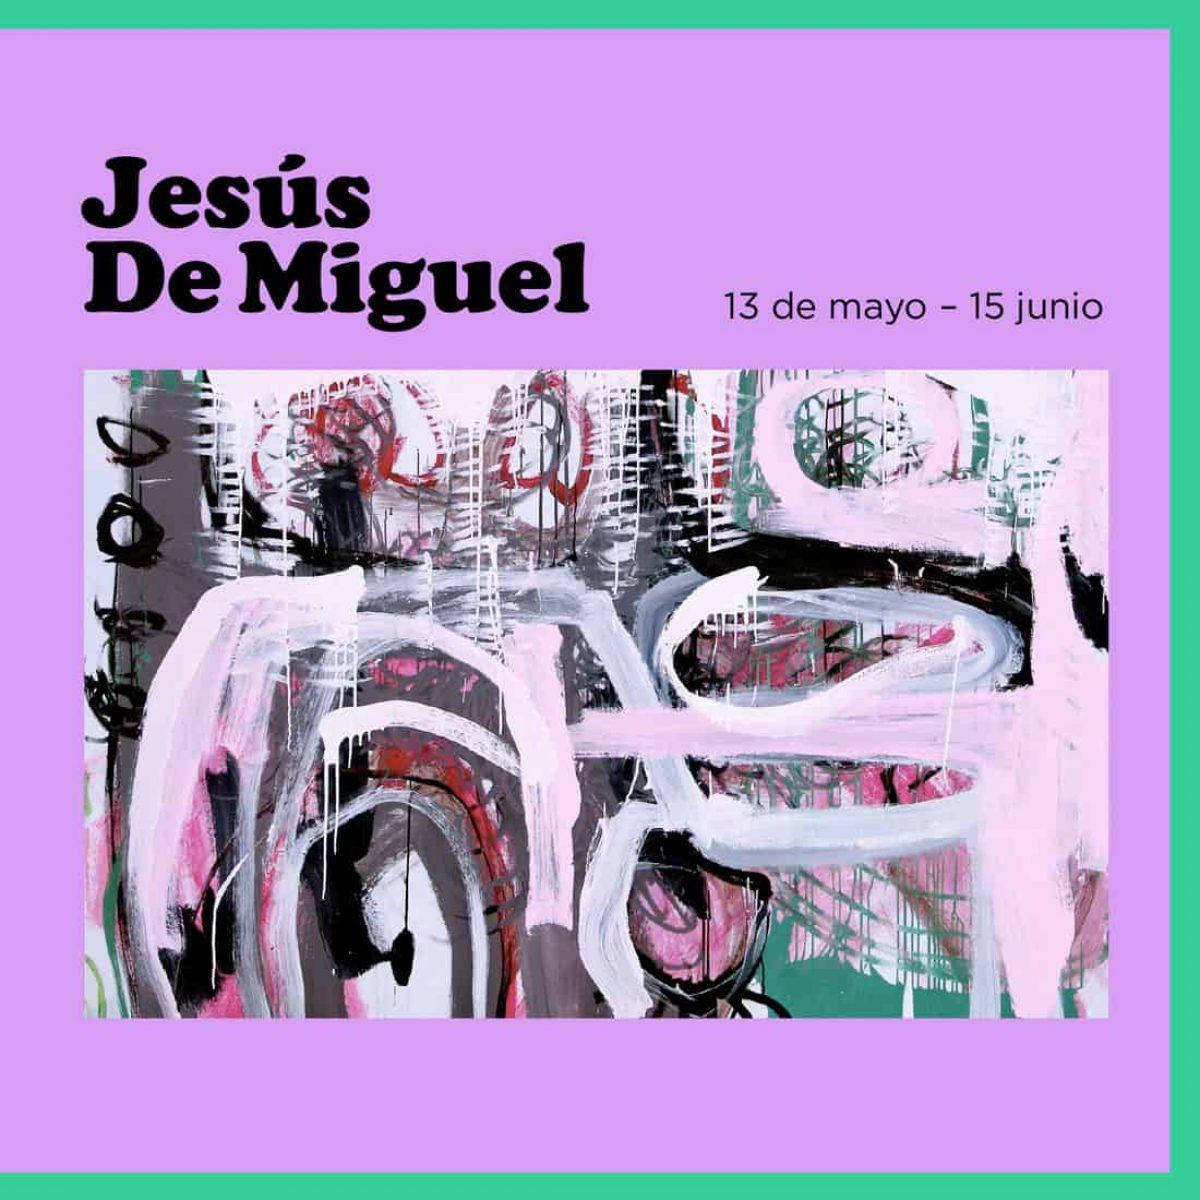 tentoonstelling-jezus-de-miguel-paradiso-art-hotel-ibiza-2021-welcometoibiza